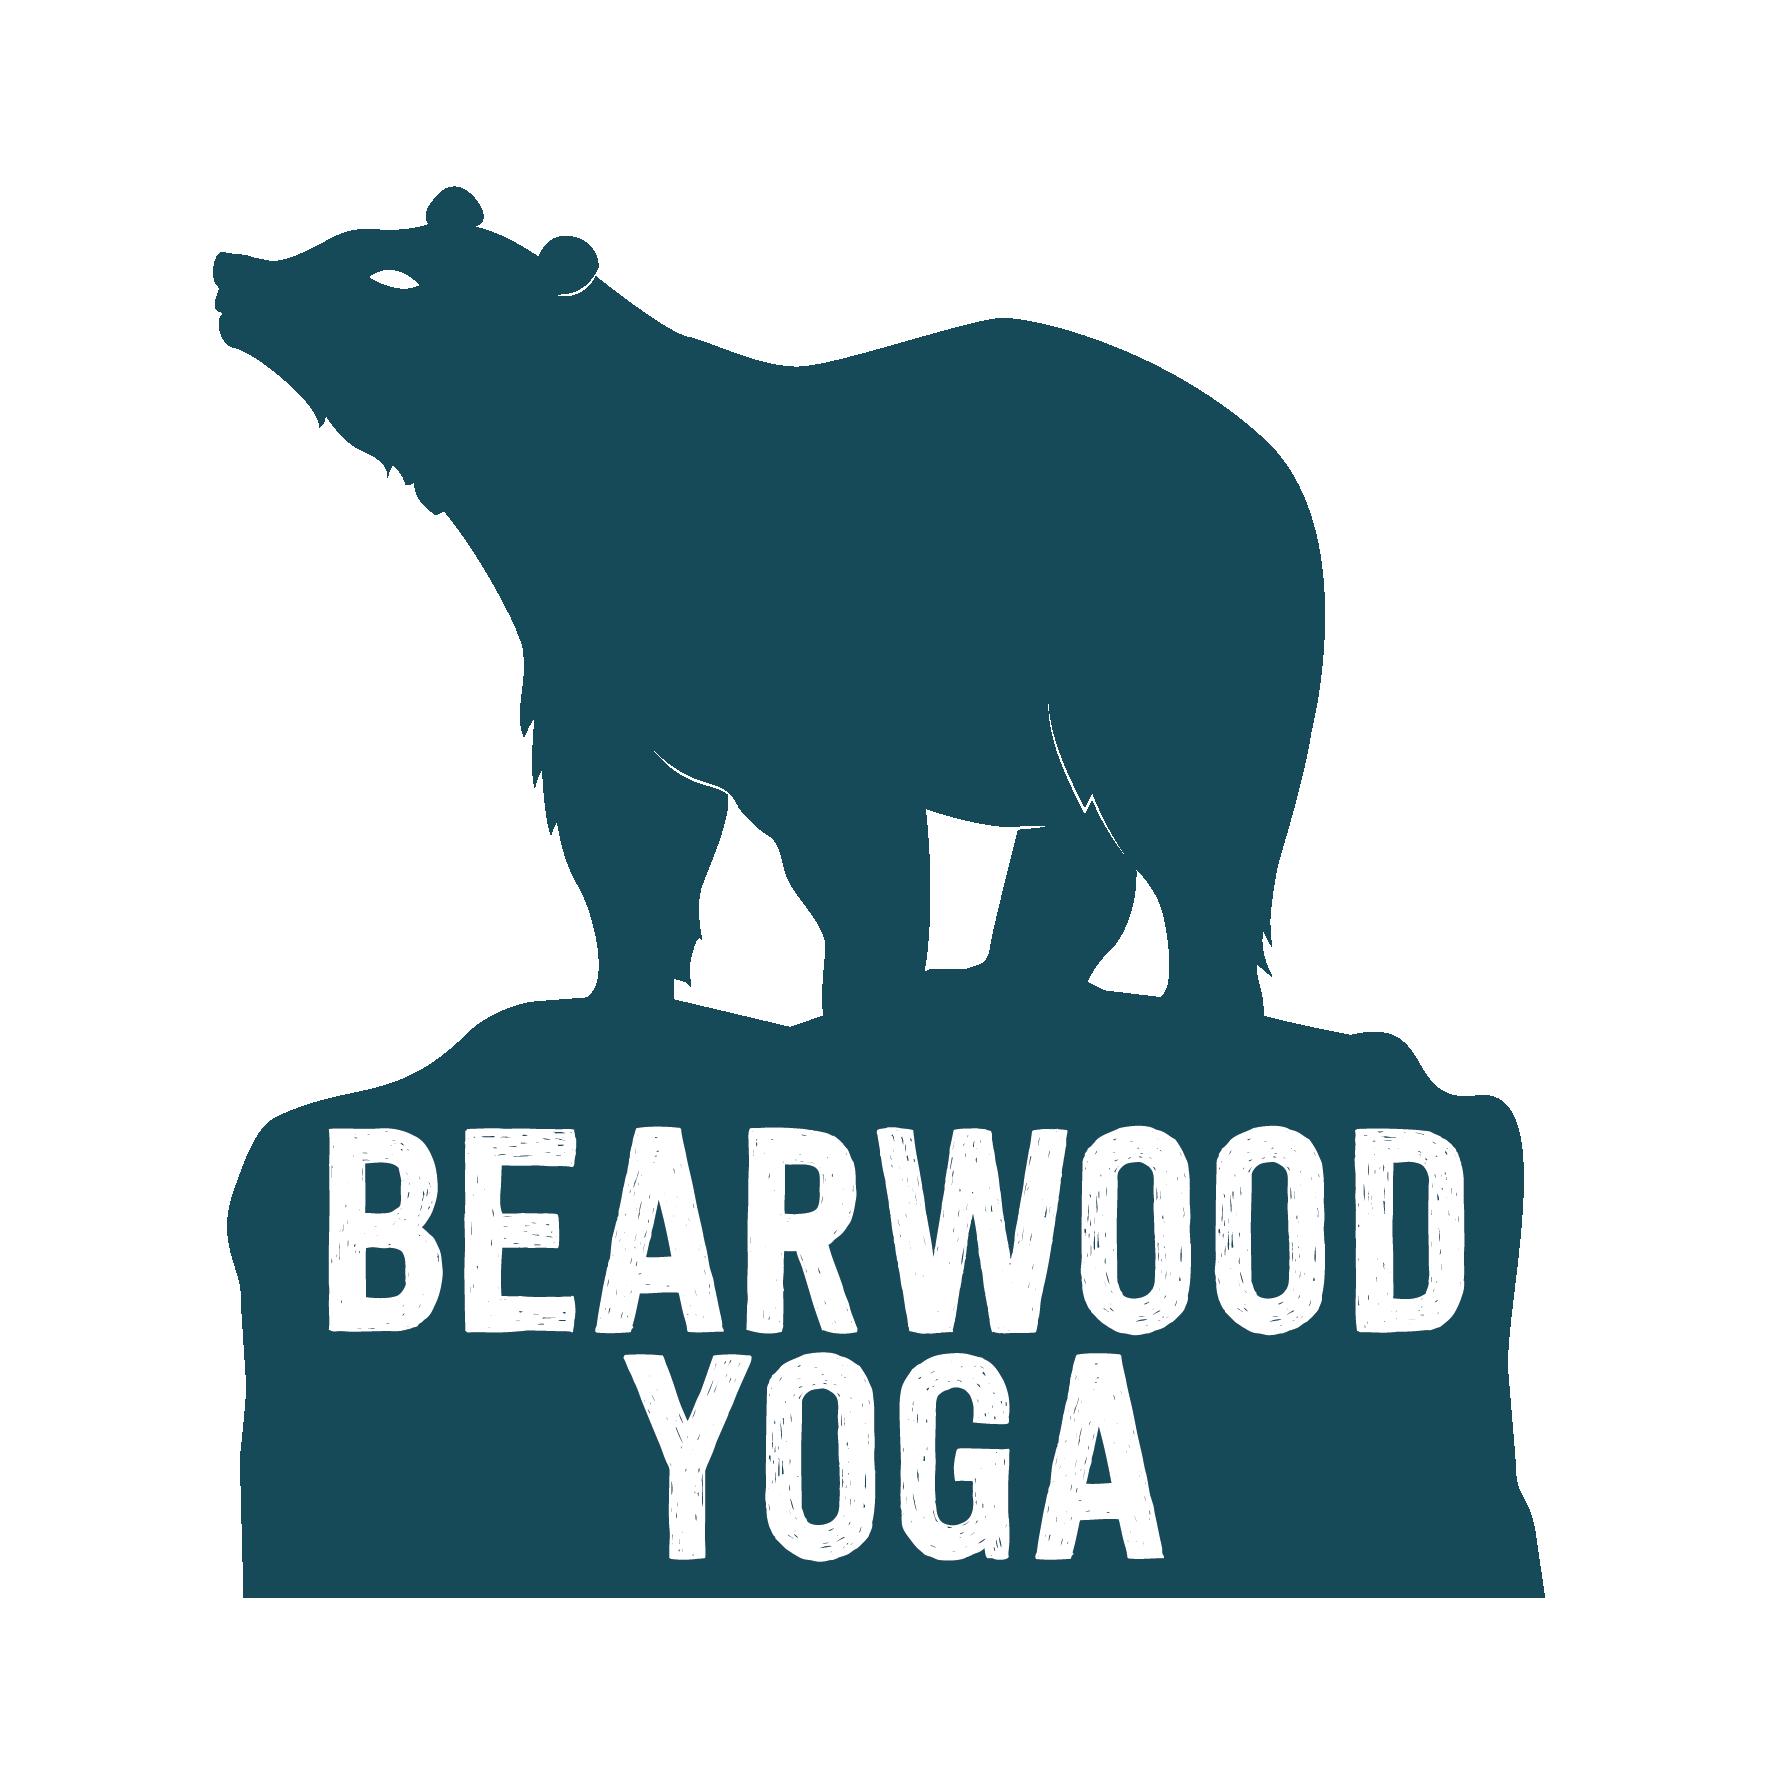 Bearwood Yoga